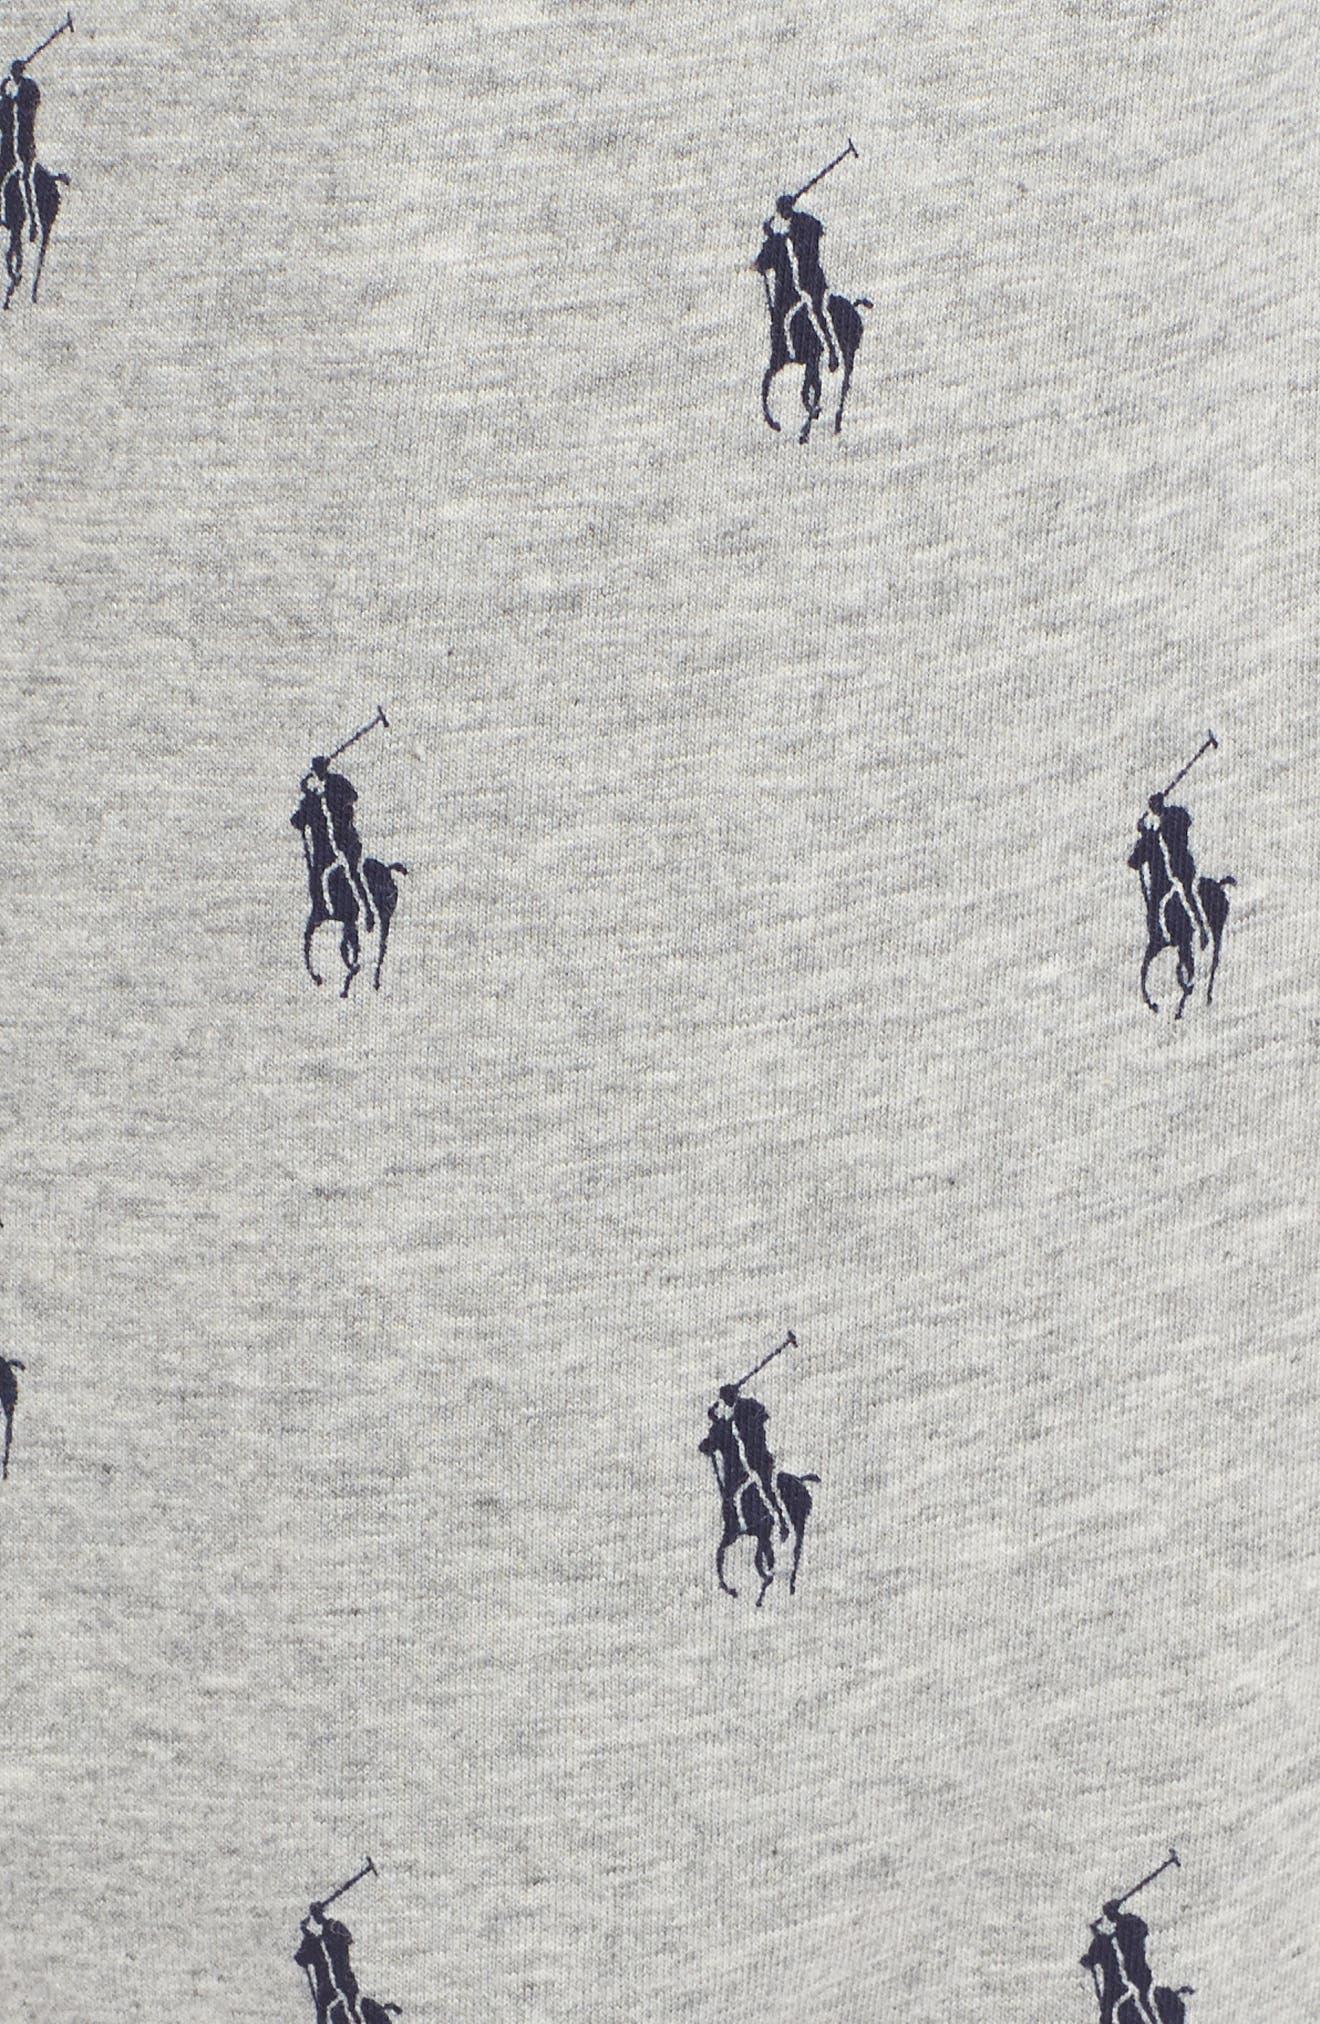 POLO RALPH LAUREN, Pony Print Pajama Pants, Alternate thumbnail 5, color, ANDOVER GREY